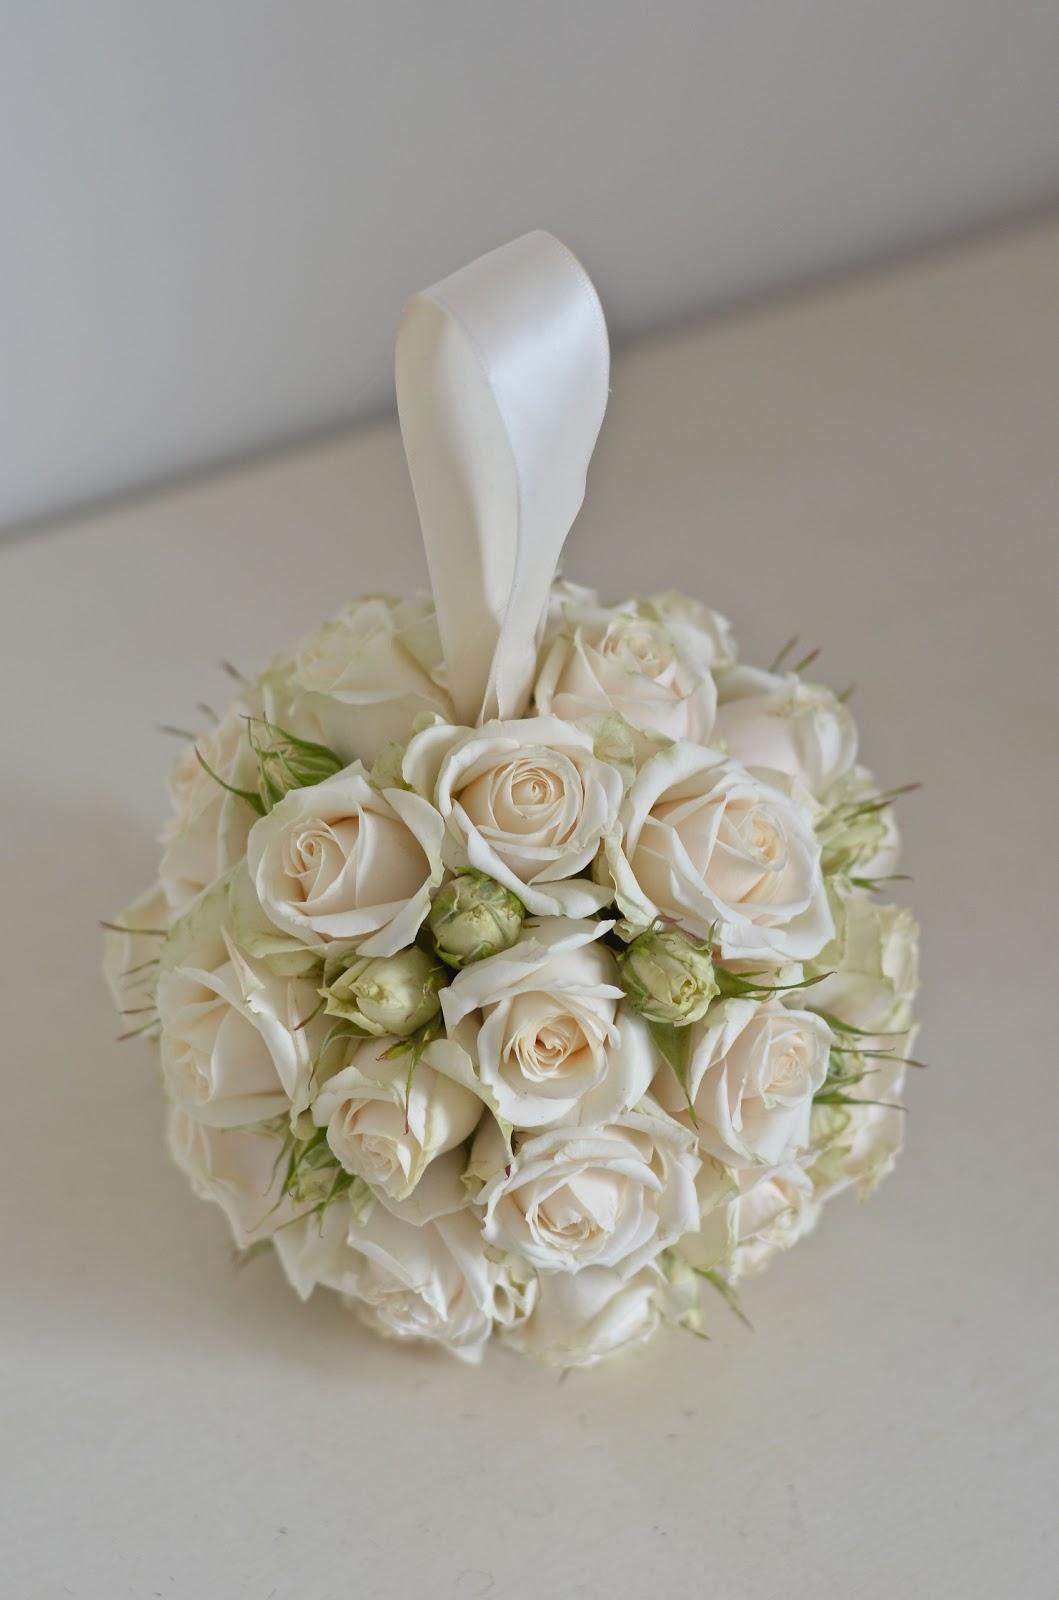 wedding flowers blog danielle 39 s classic wedding flowers careys manor. Black Bedroom Furniture Sets. Home Design Ideas